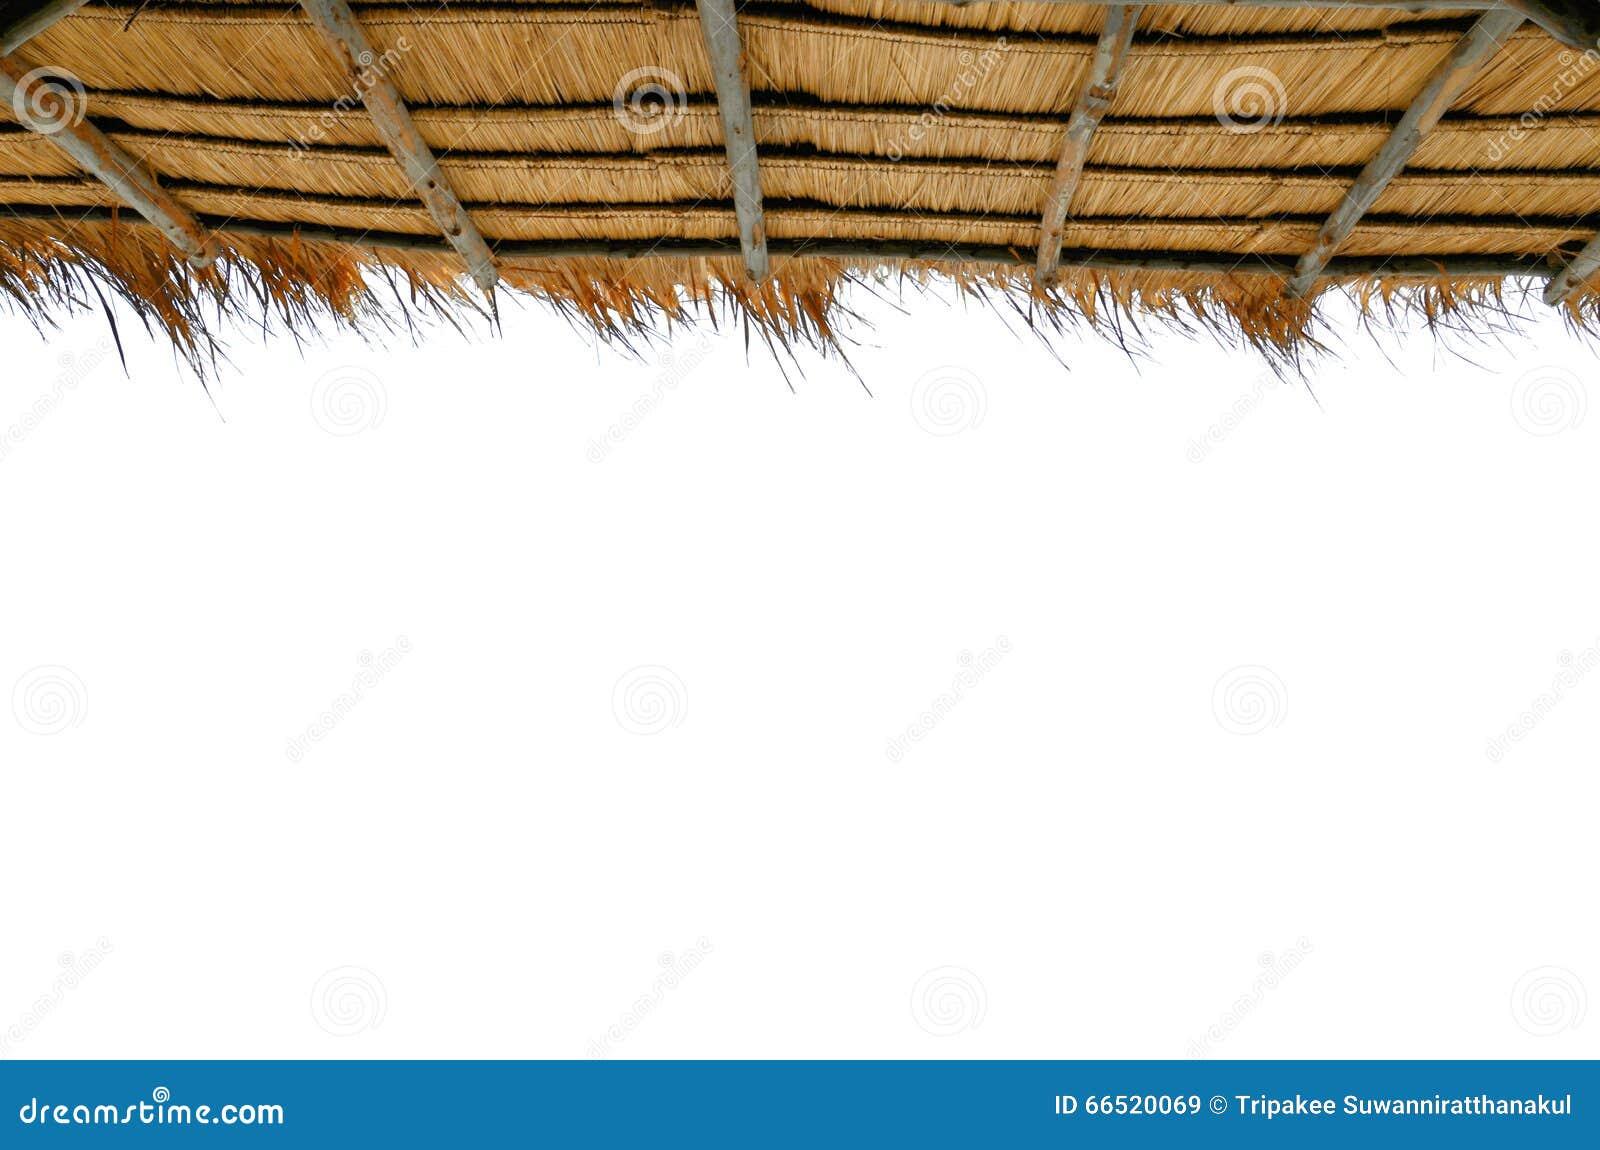 Trawa dachy